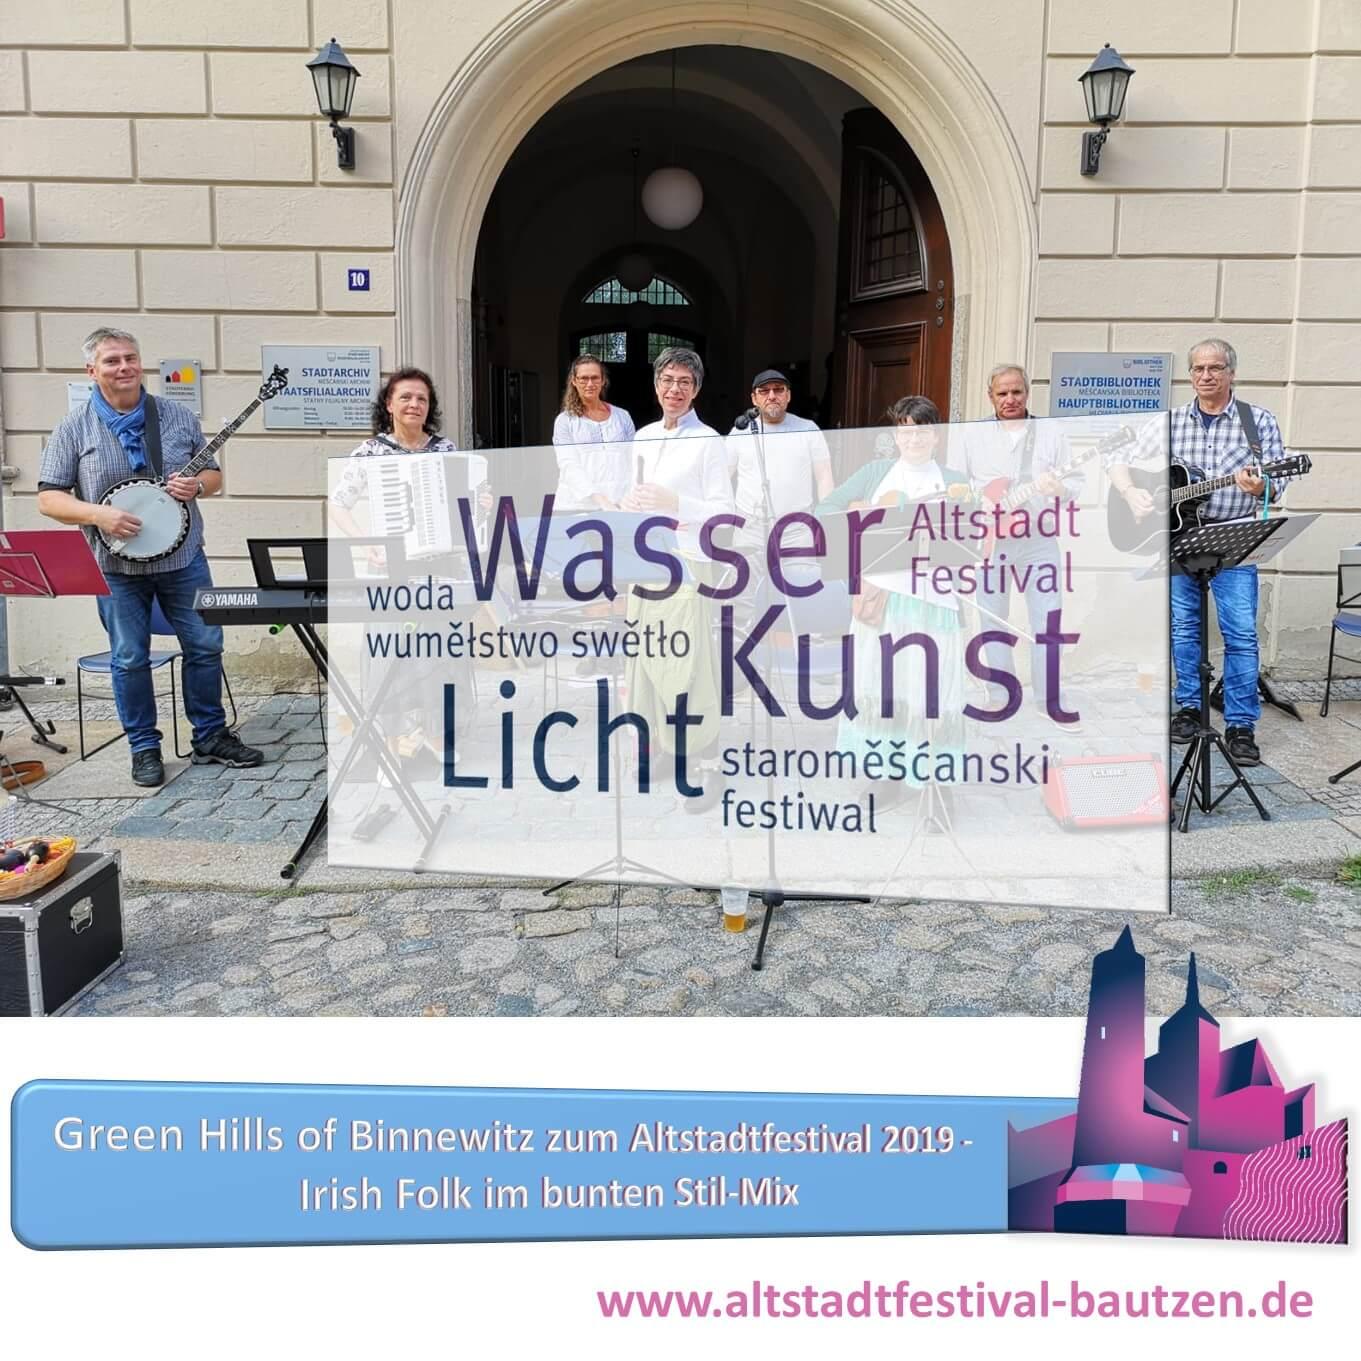 Beitrag Green Hills of Binnewitz zum Altstadtfestival 2019